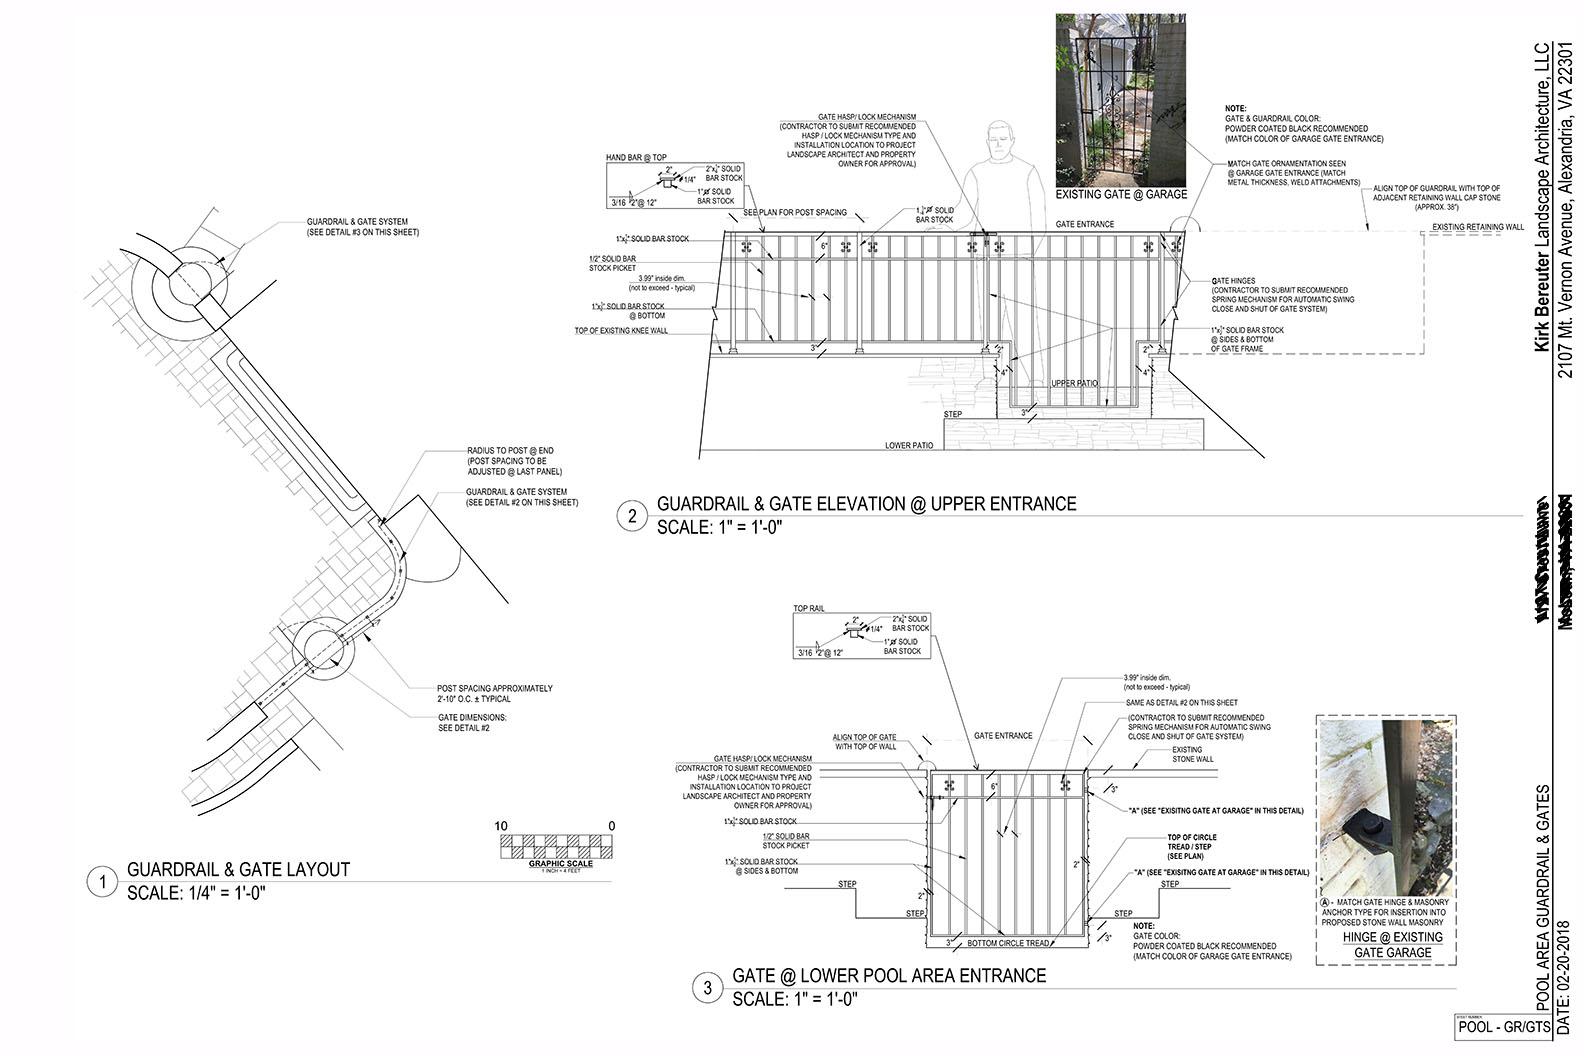 Noreika Guardrail Revised 20180220.jpg